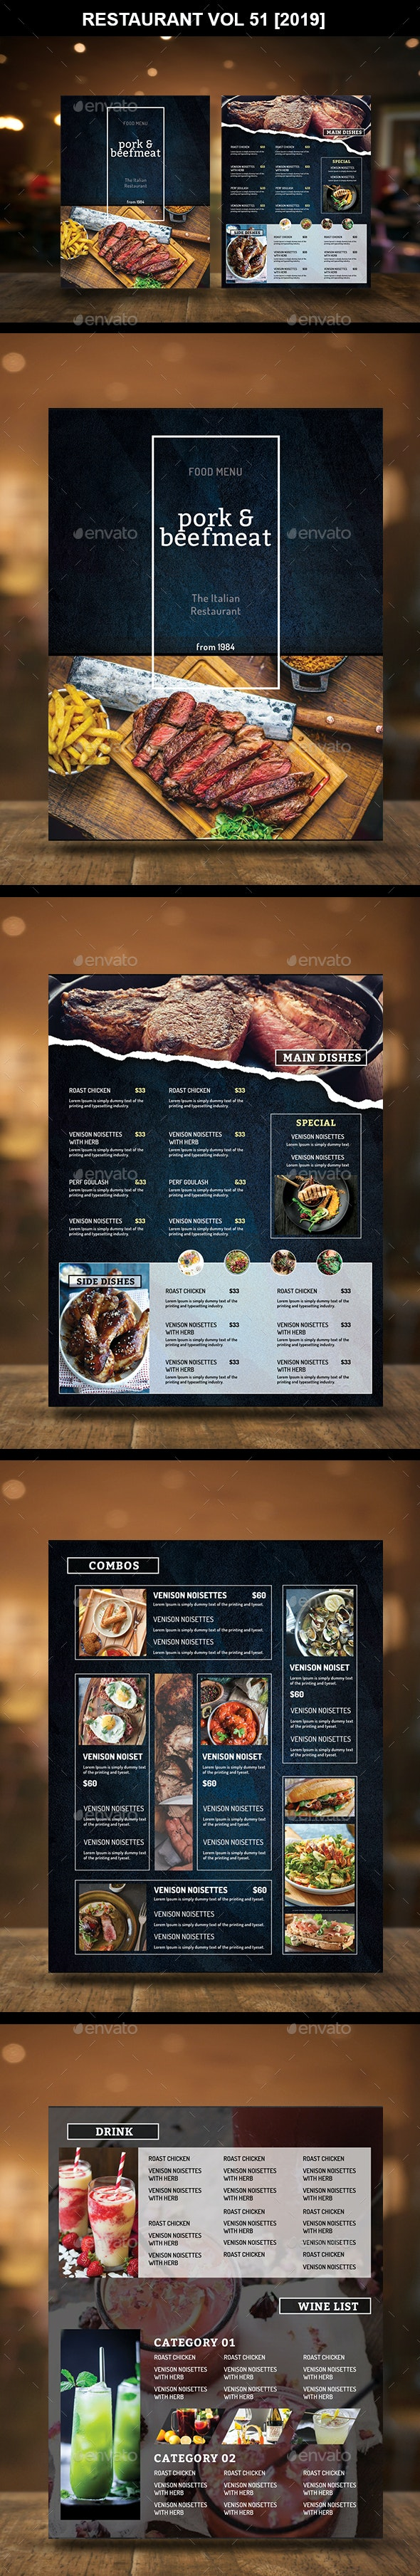 Restaurant Menu Vol 51 - Food Menus Print Templates